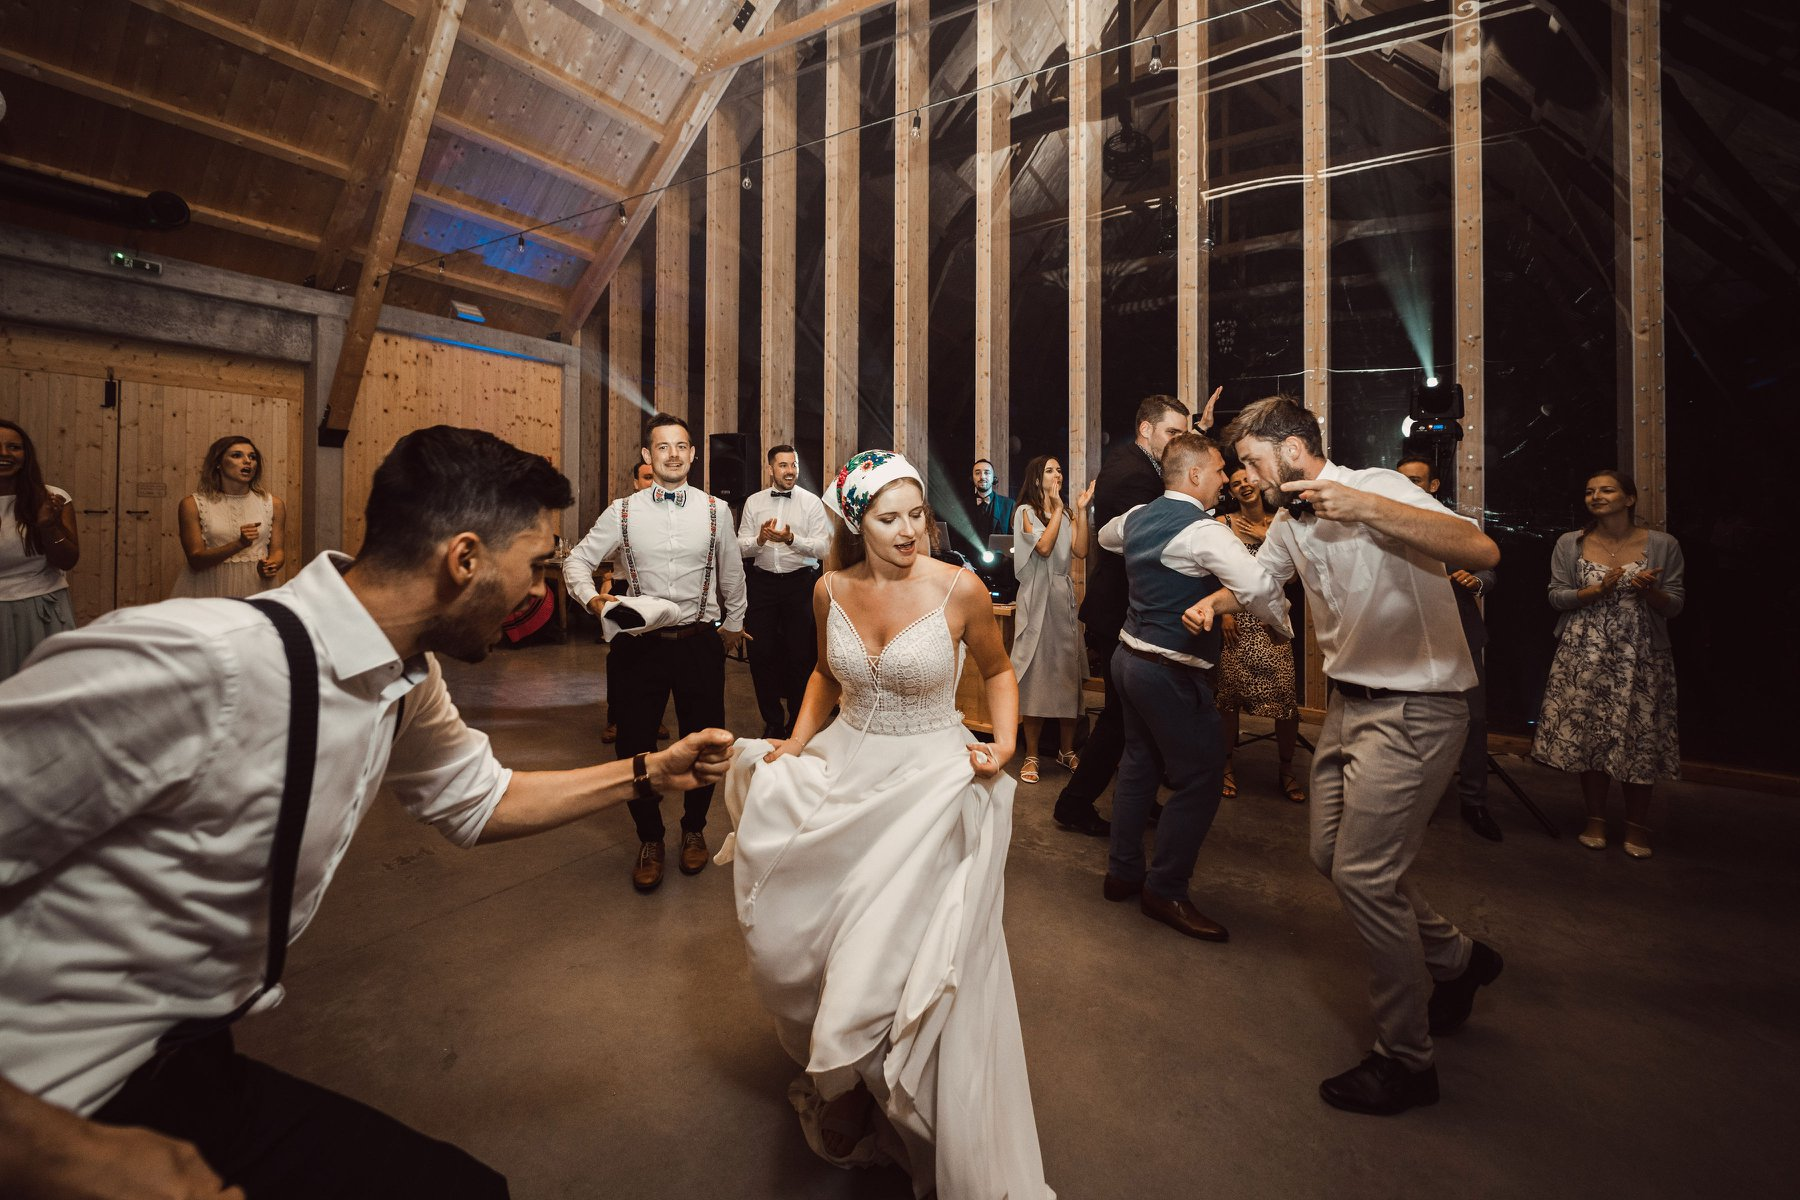 svadba-dj-mikejpg